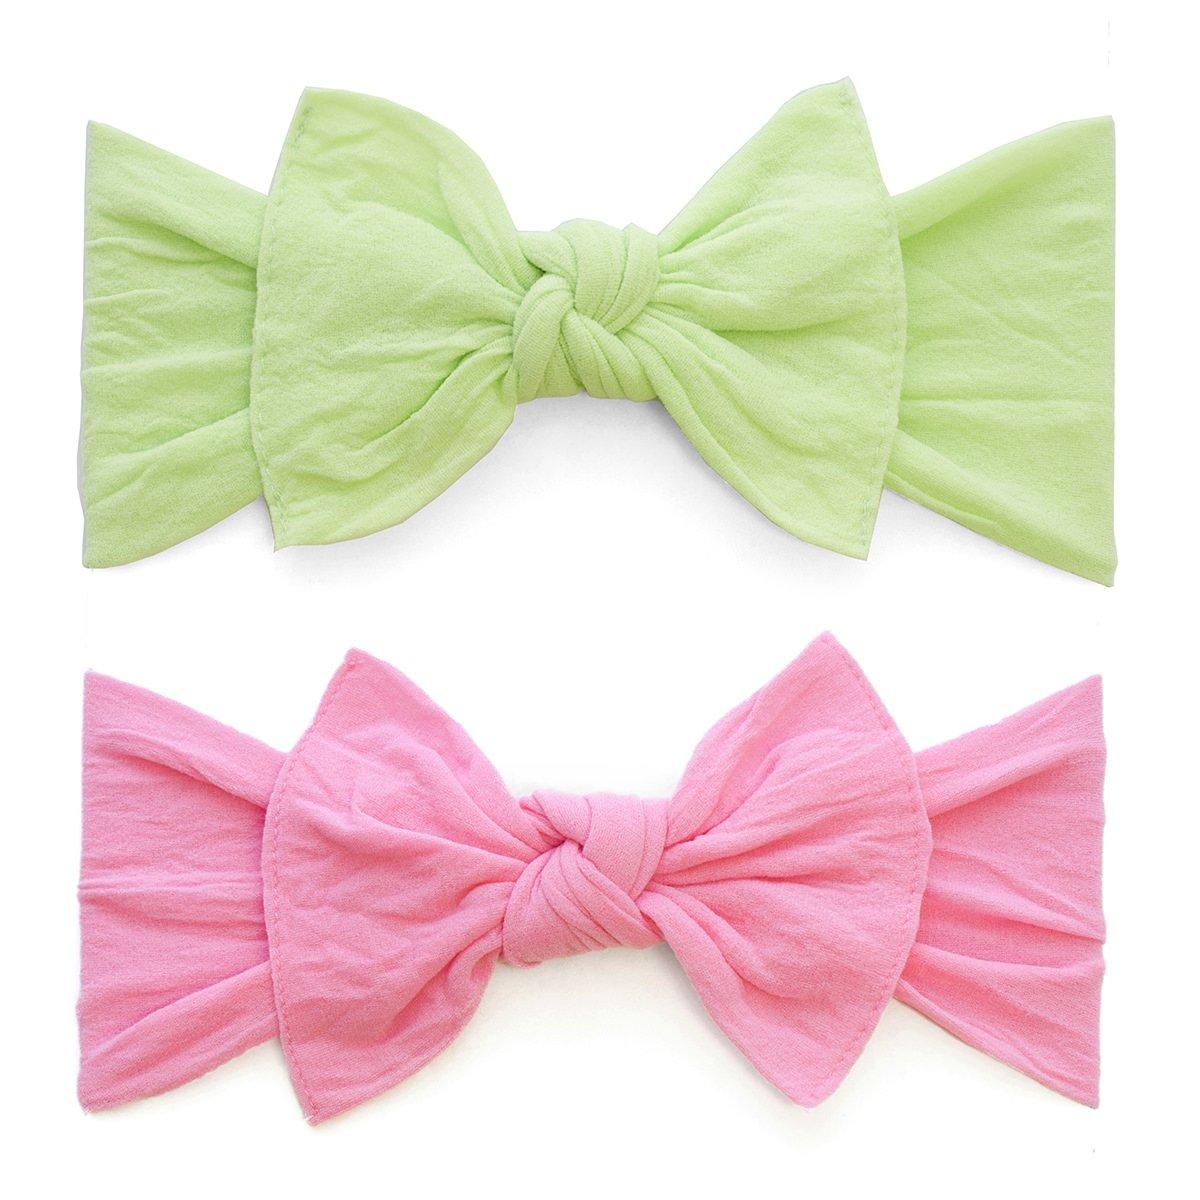 Creative Peach Heart Handmade Boutique Hair Bow New Kids' Clothing, Shoes & Accs